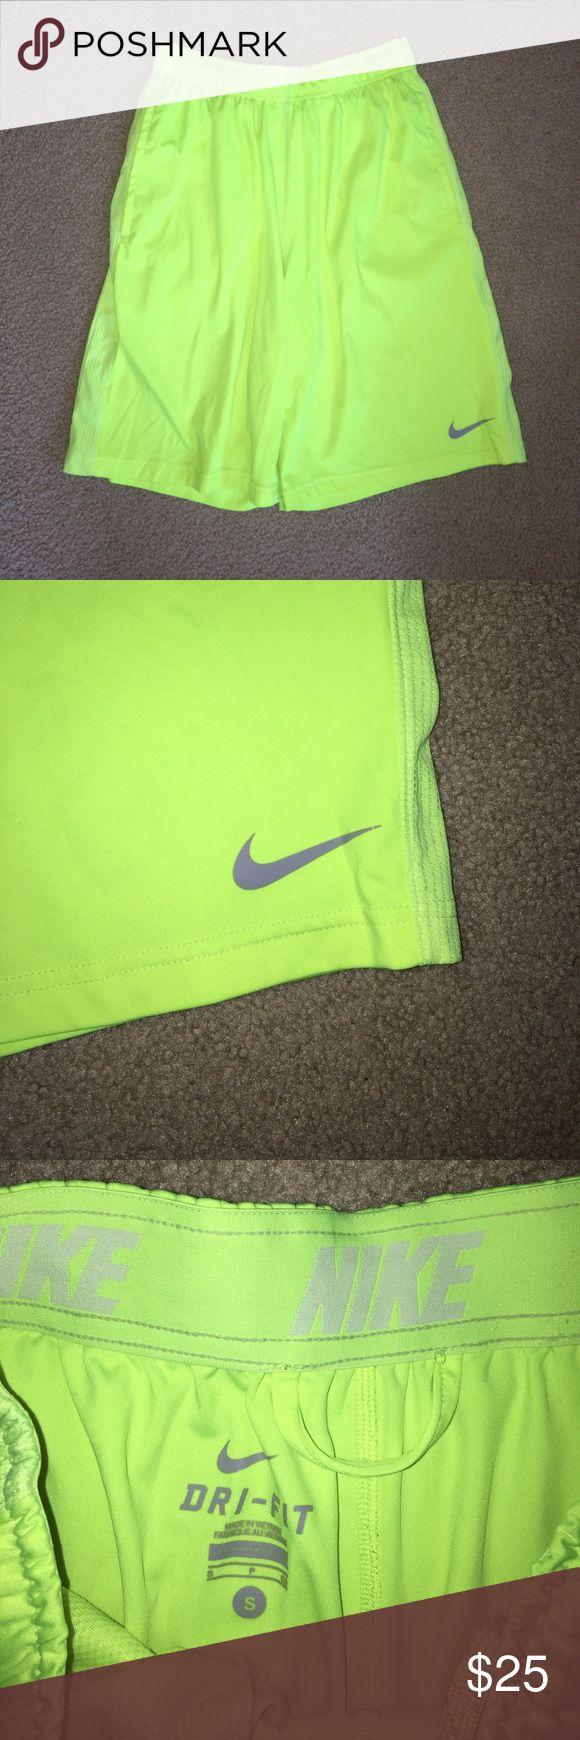 Neon Yellow Nike Basketball Shorts GREAT Condition. Worn a few times. Nike Shorts